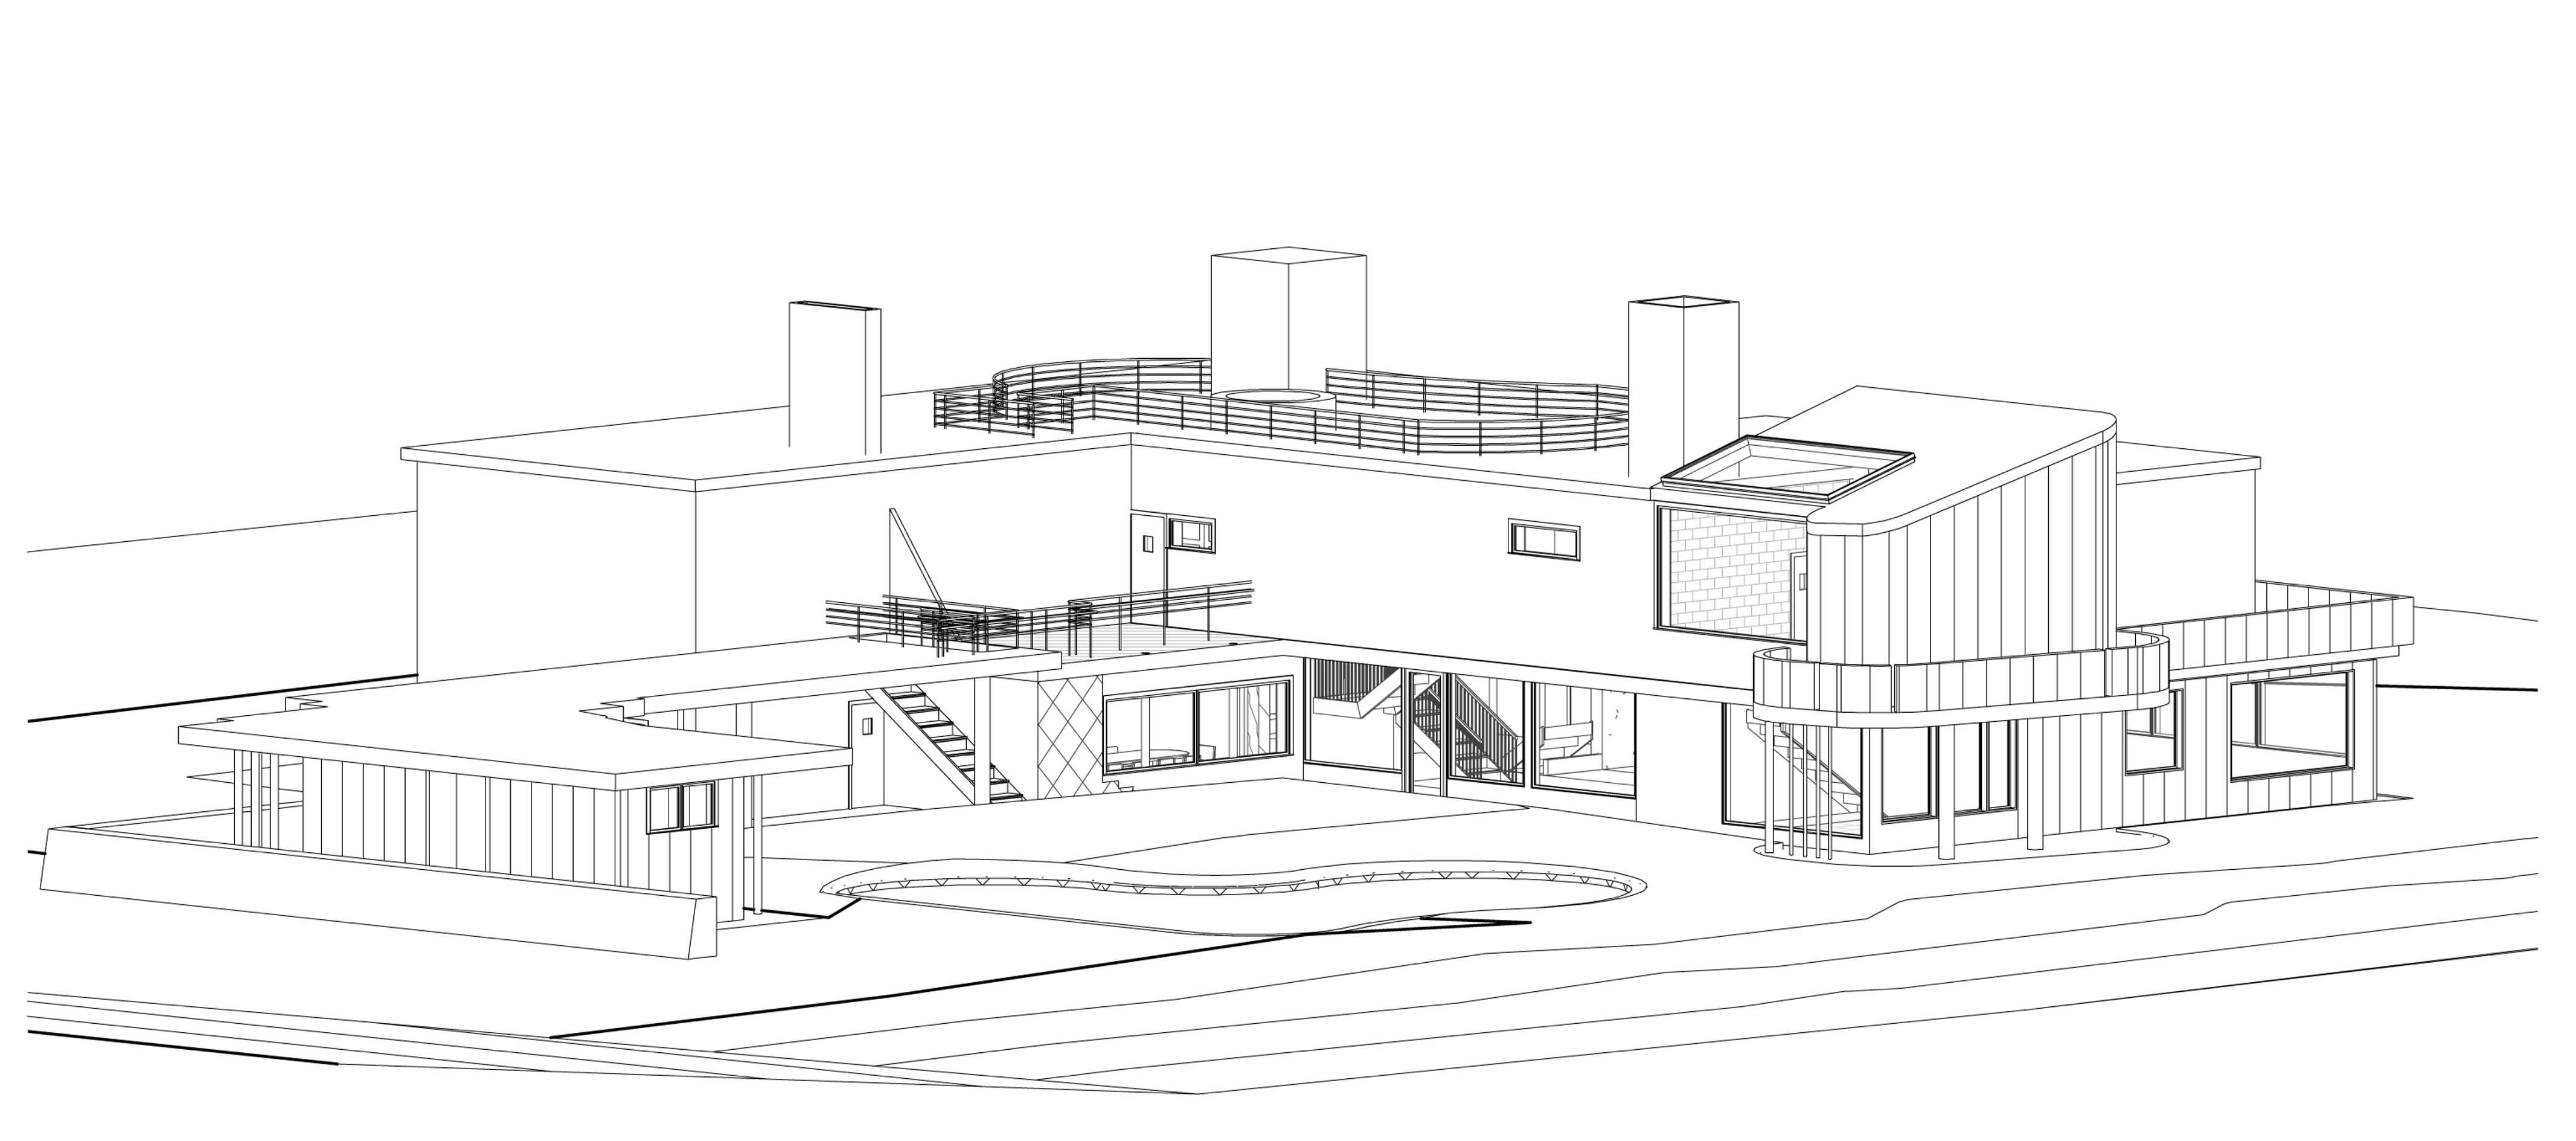 Alvar Aalto Villa Mairea 1938 39 Axonometric View